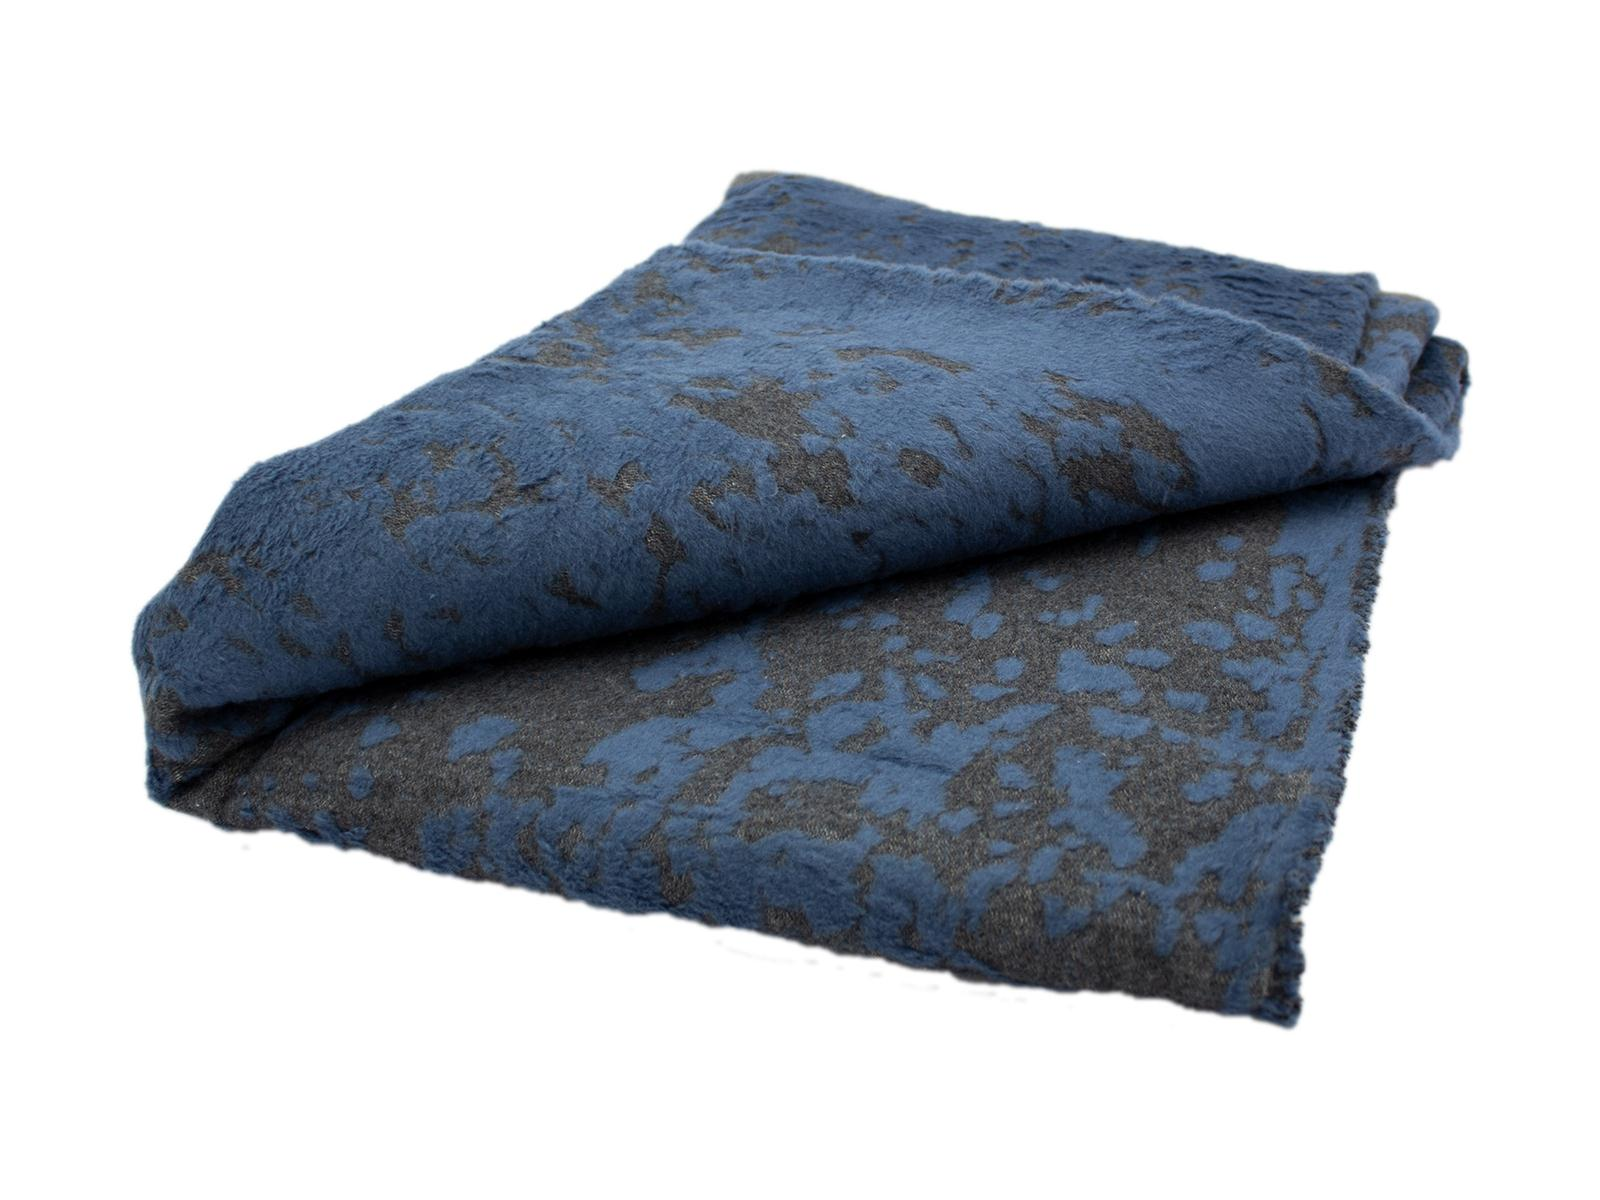 DAVID FUSSENEGGER Decke/Plaid DECO abblätternde Farbe-Optik, blau, 130x200 cm